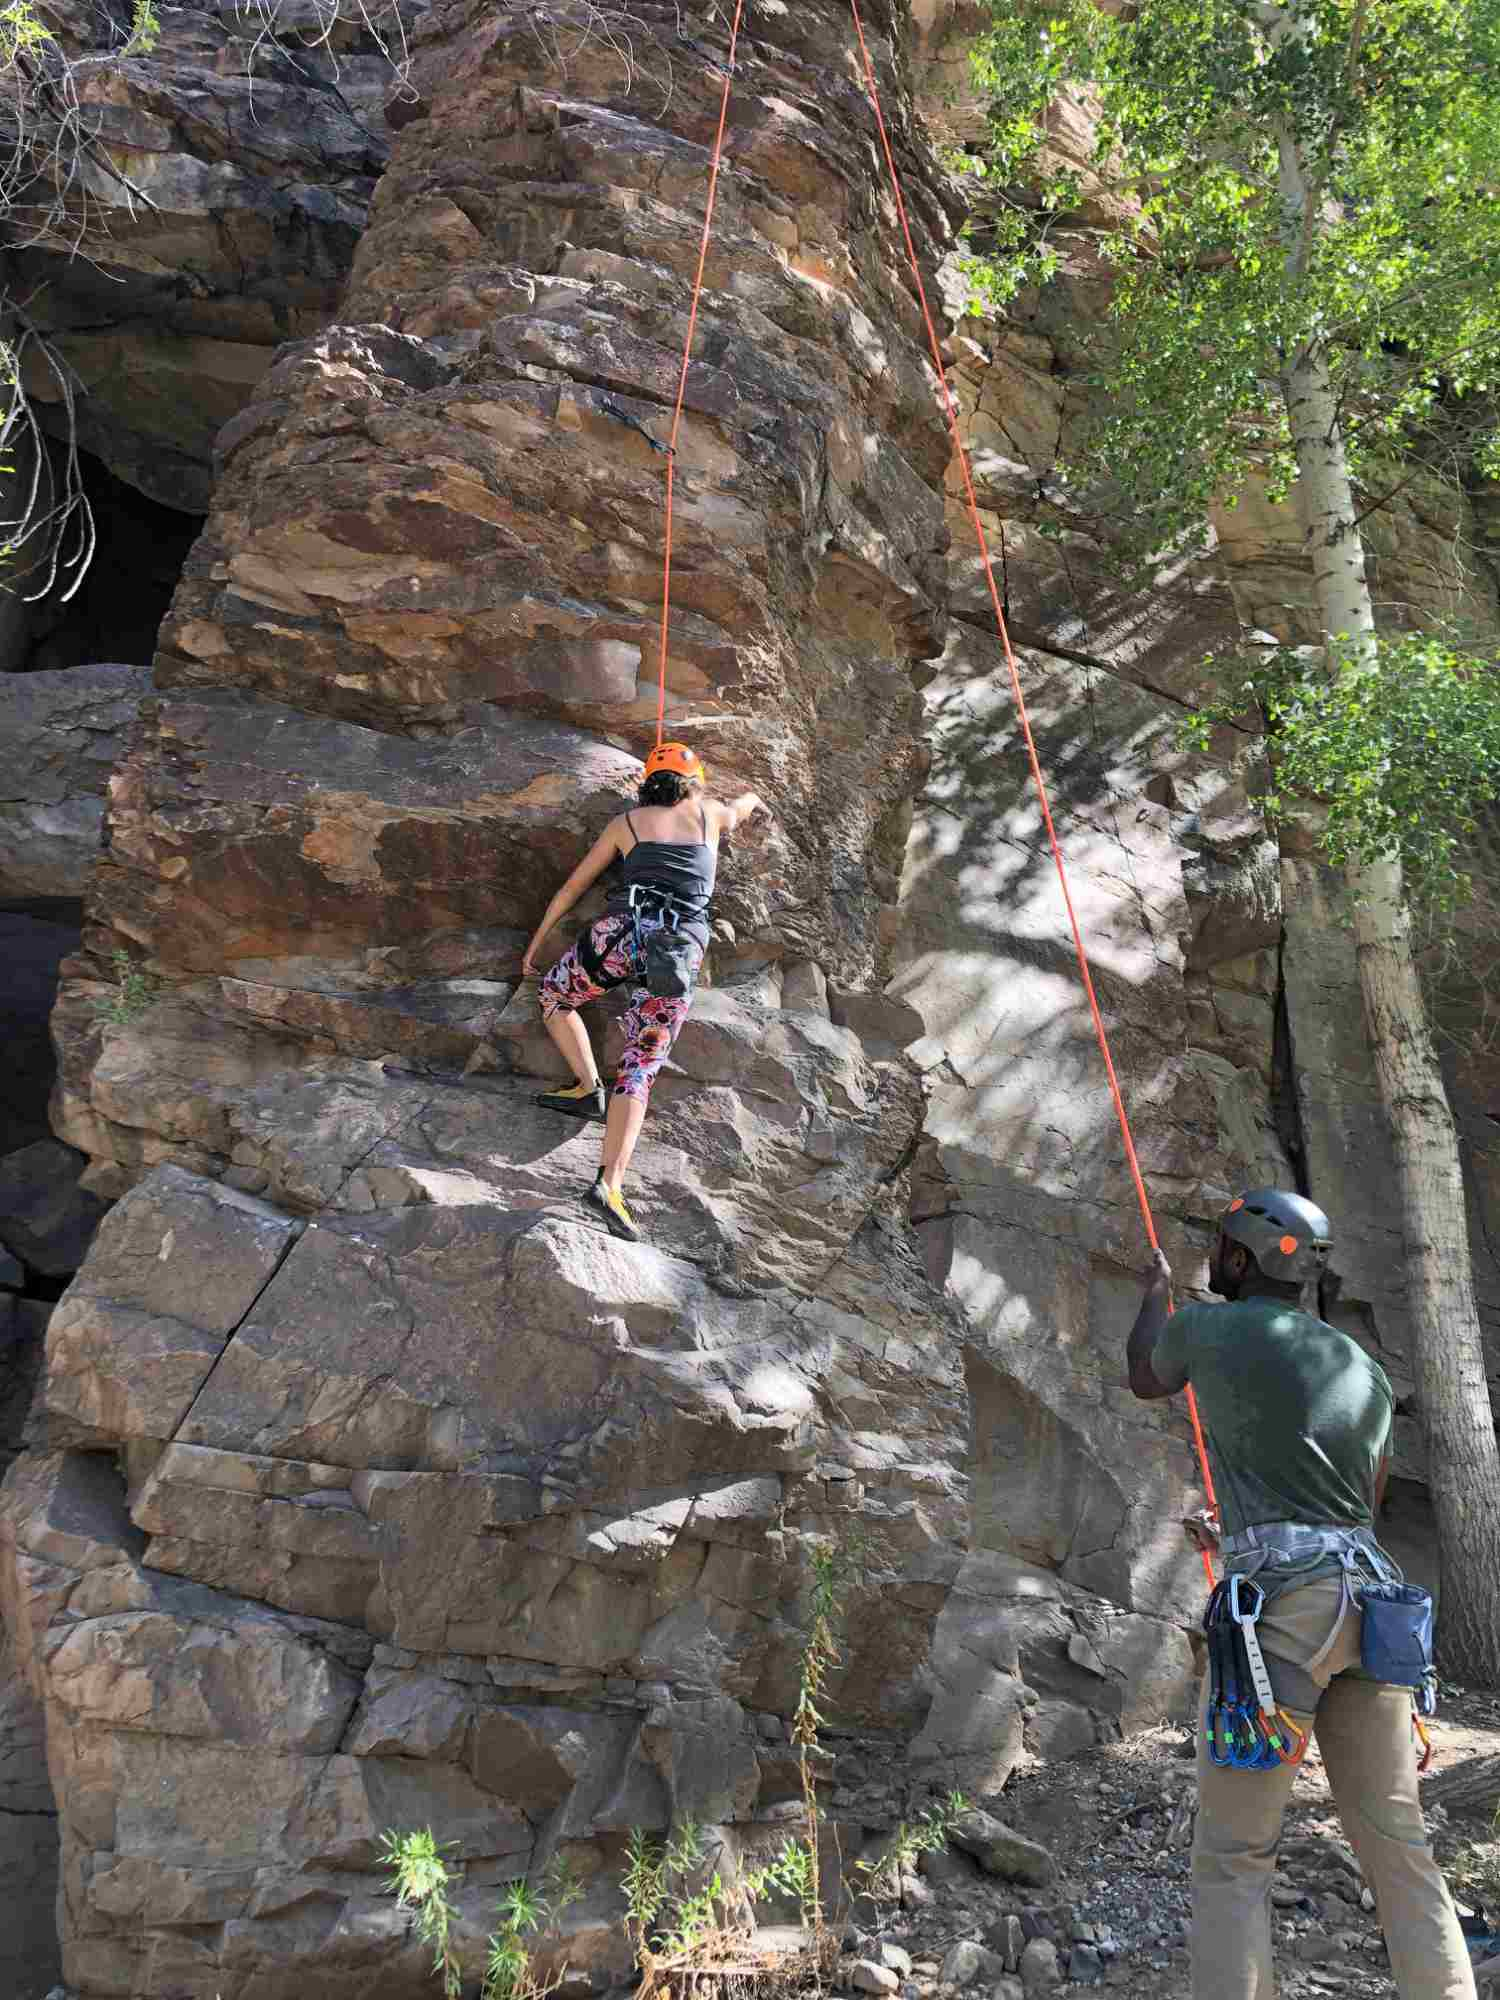 Climbing on top rope on New Kids on the Block, Percha Creek